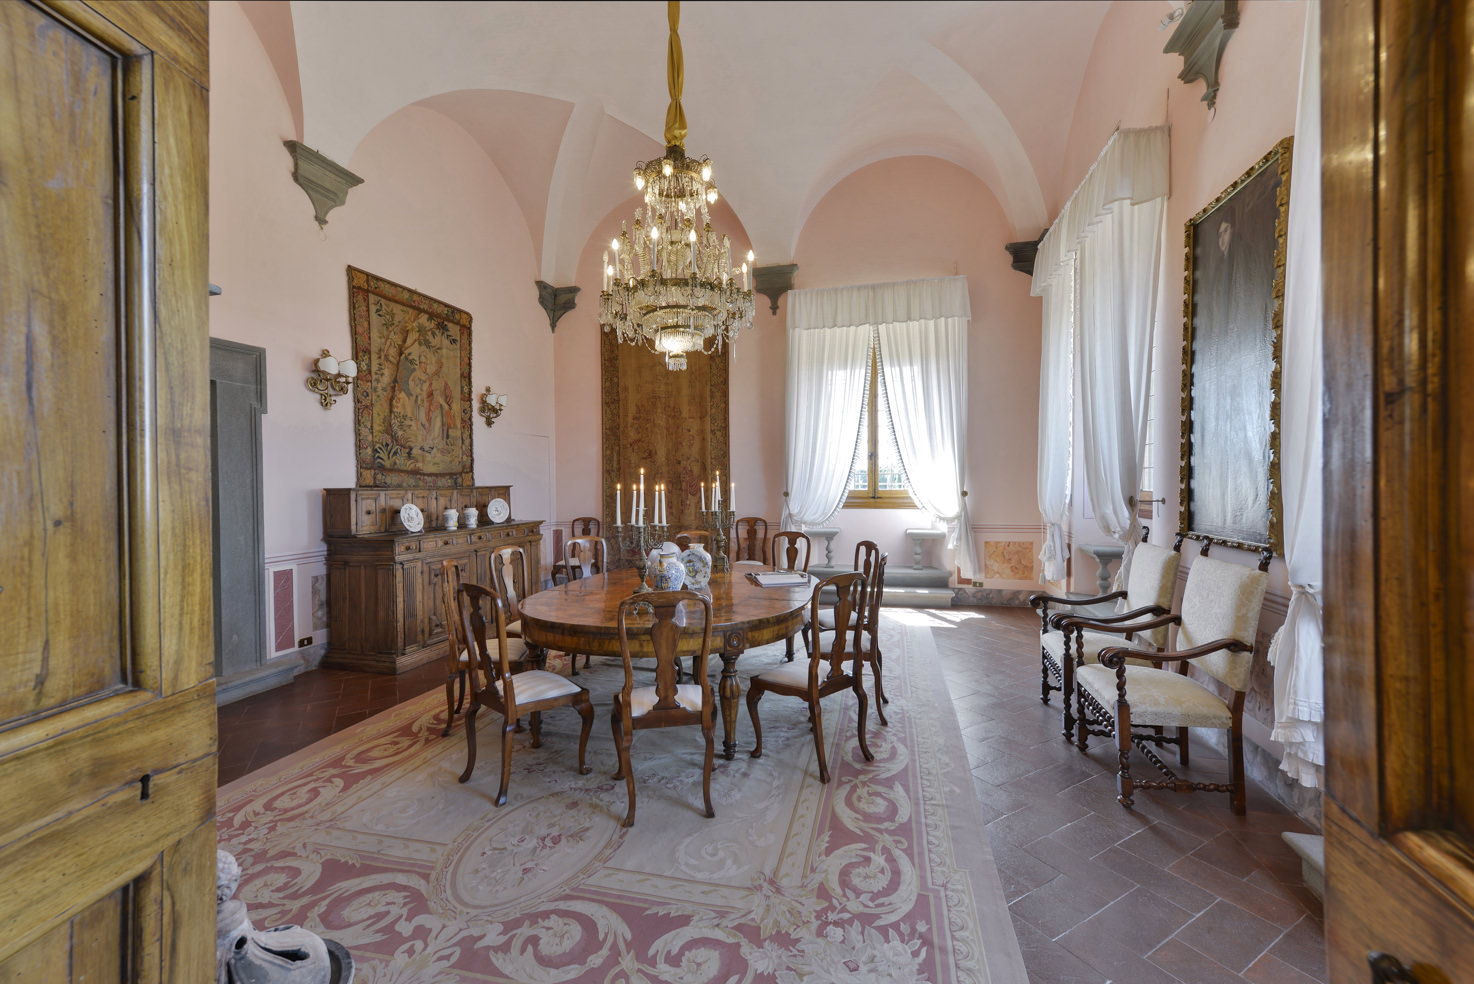 Interior of Villa Gamberaia